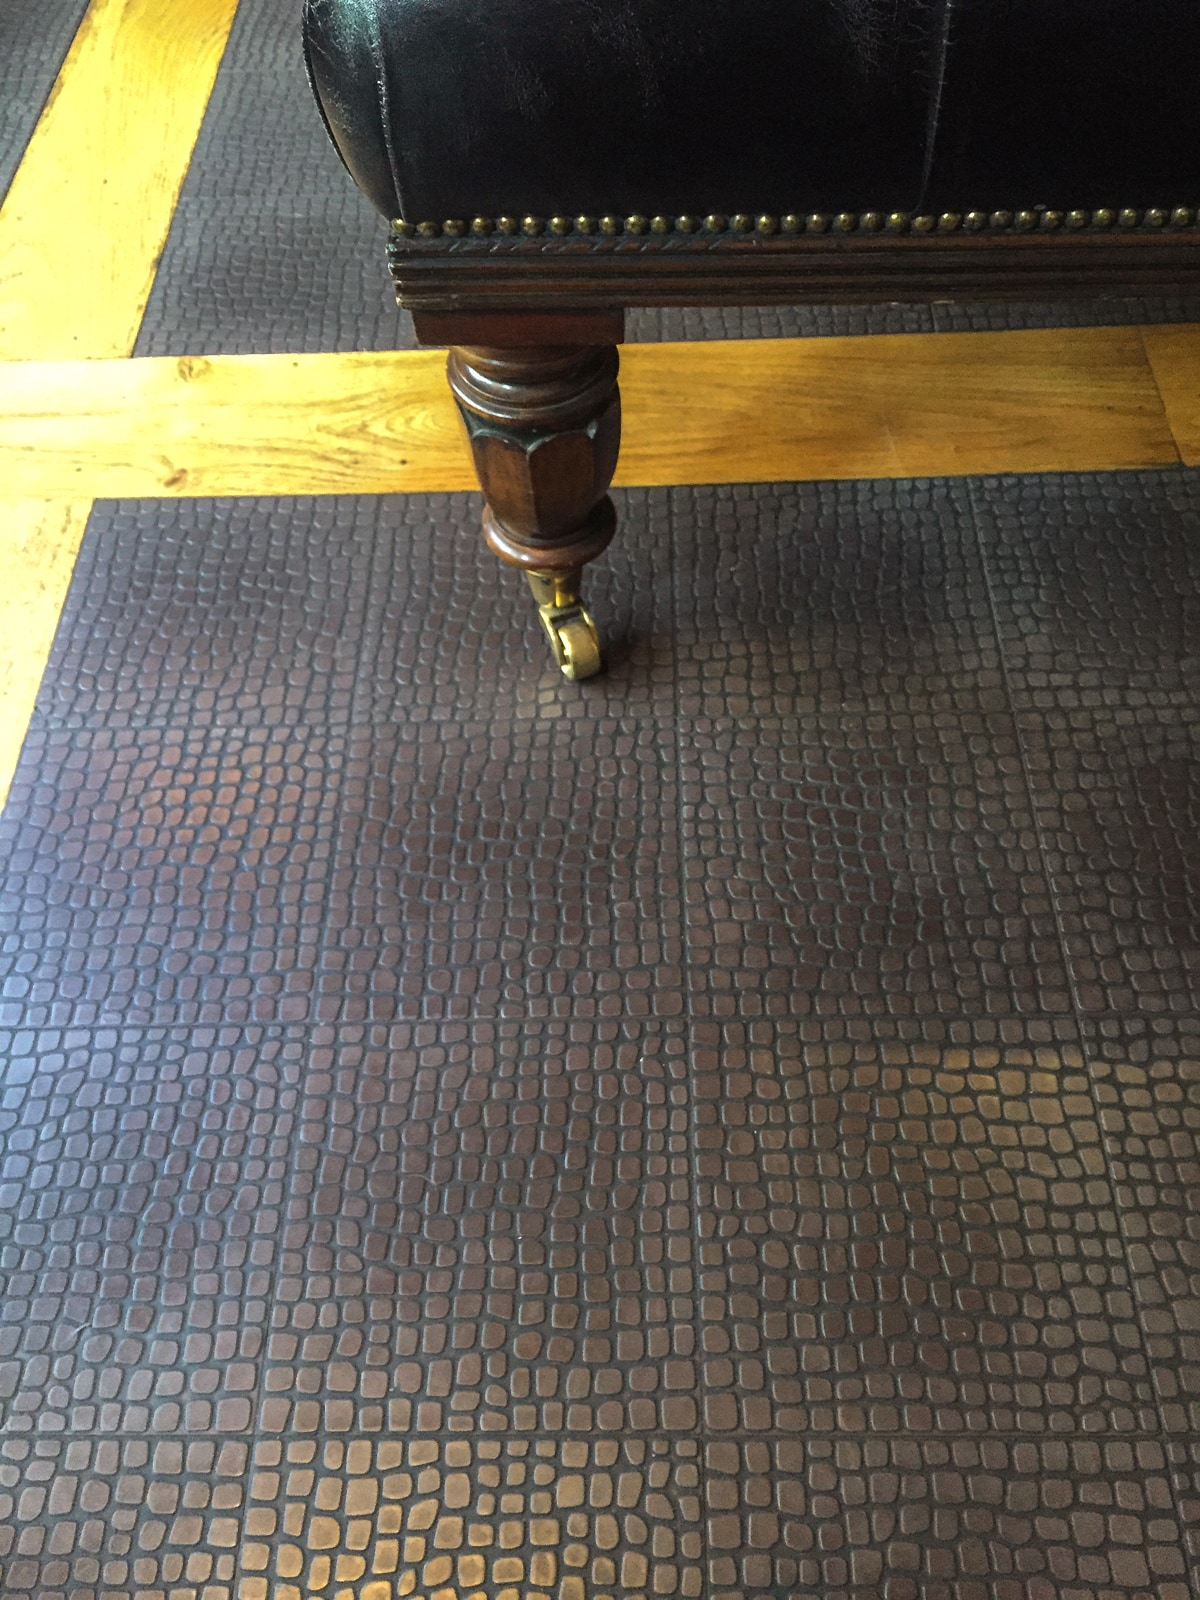 zementfliesen-VIA_zementmosaikplatten-nr.40760-hotel-monbijou-viaplatten   40760